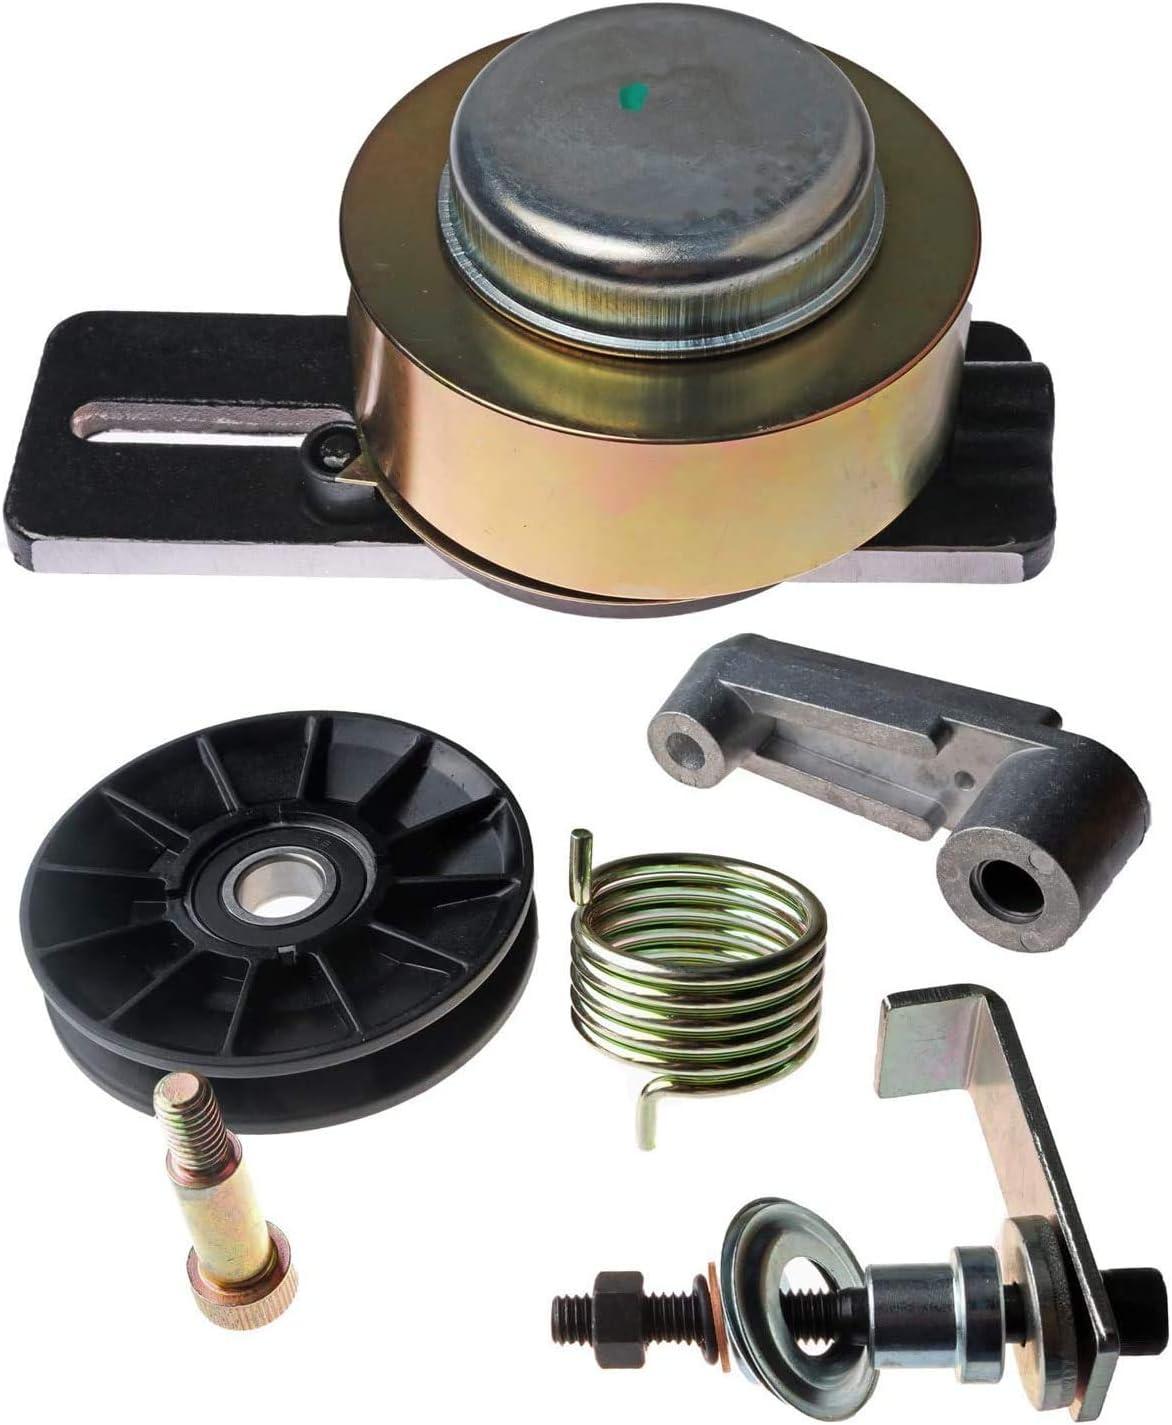 JEENDA Drive Belt Tensioner & Cooling Fan Pulley Tensioner Kit 6735884 6662997 for Bobcat 653 751 753 763 773 7753 S130 S150 S160 S175 S185 S205 T140 T180 T190